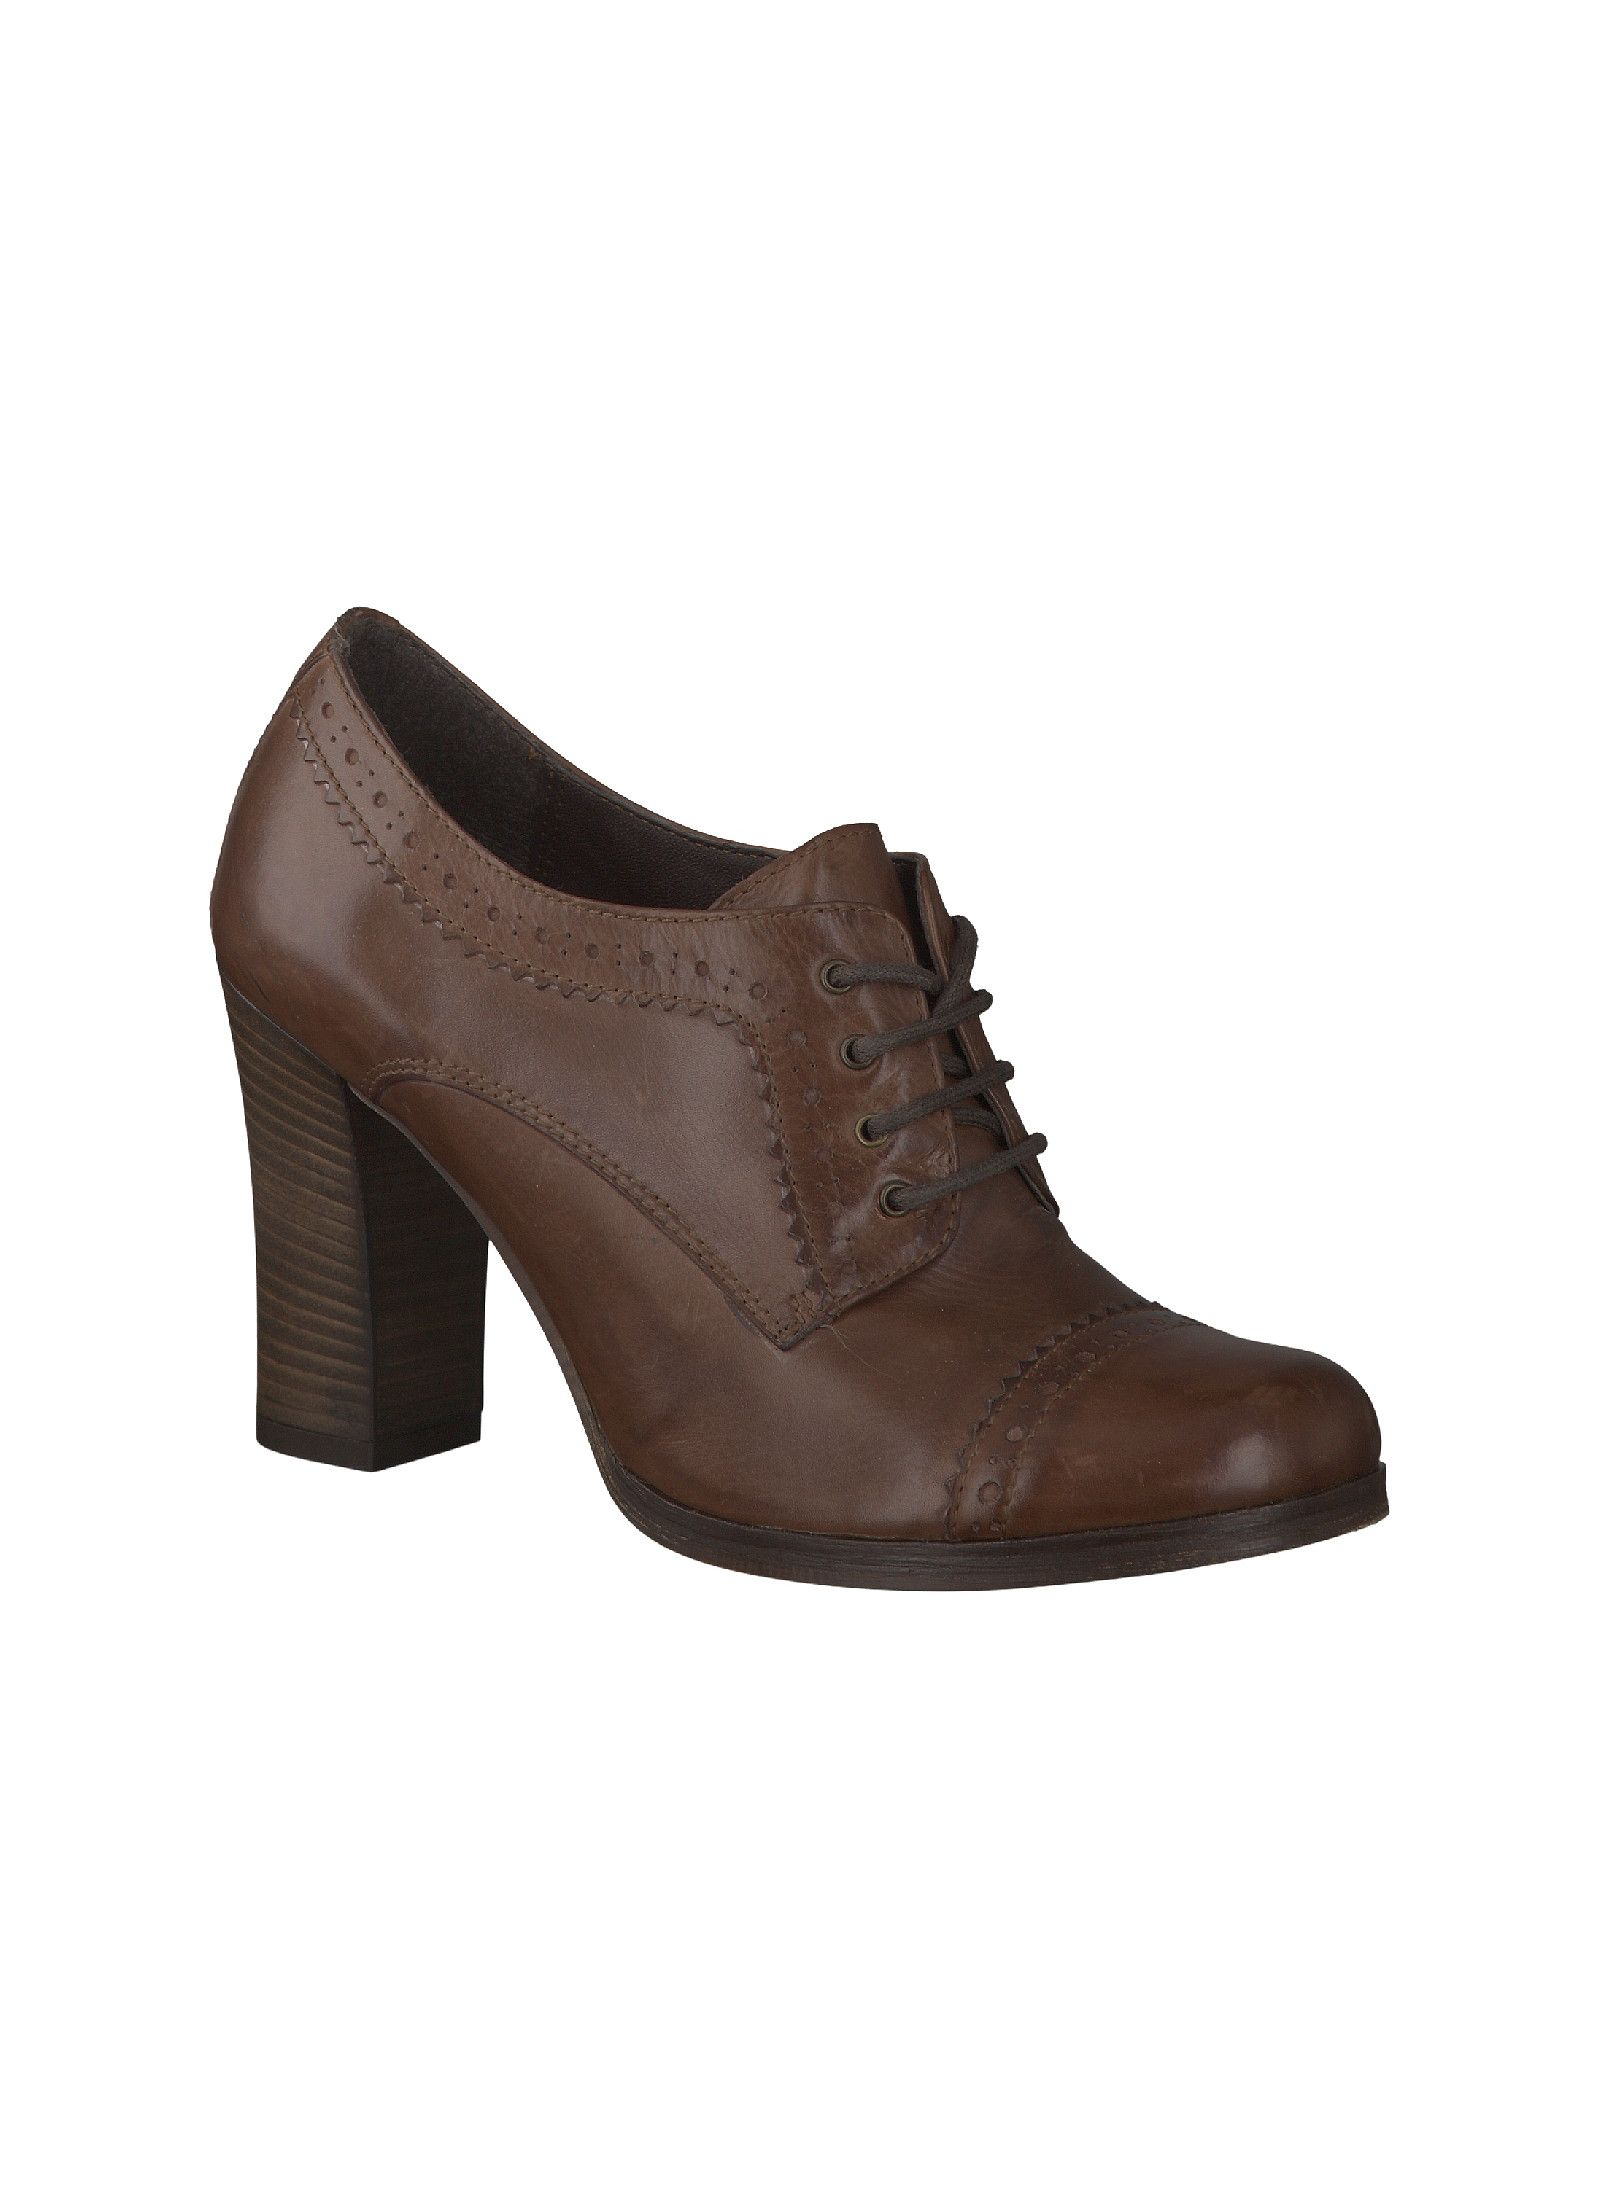 Reno Venturini Ankle Boot Mittelbraun Stiefeletten Damen Schuhe Reno Online Shop Fur Marken Schuhe Oxford Shoes Womens Oxfords Women